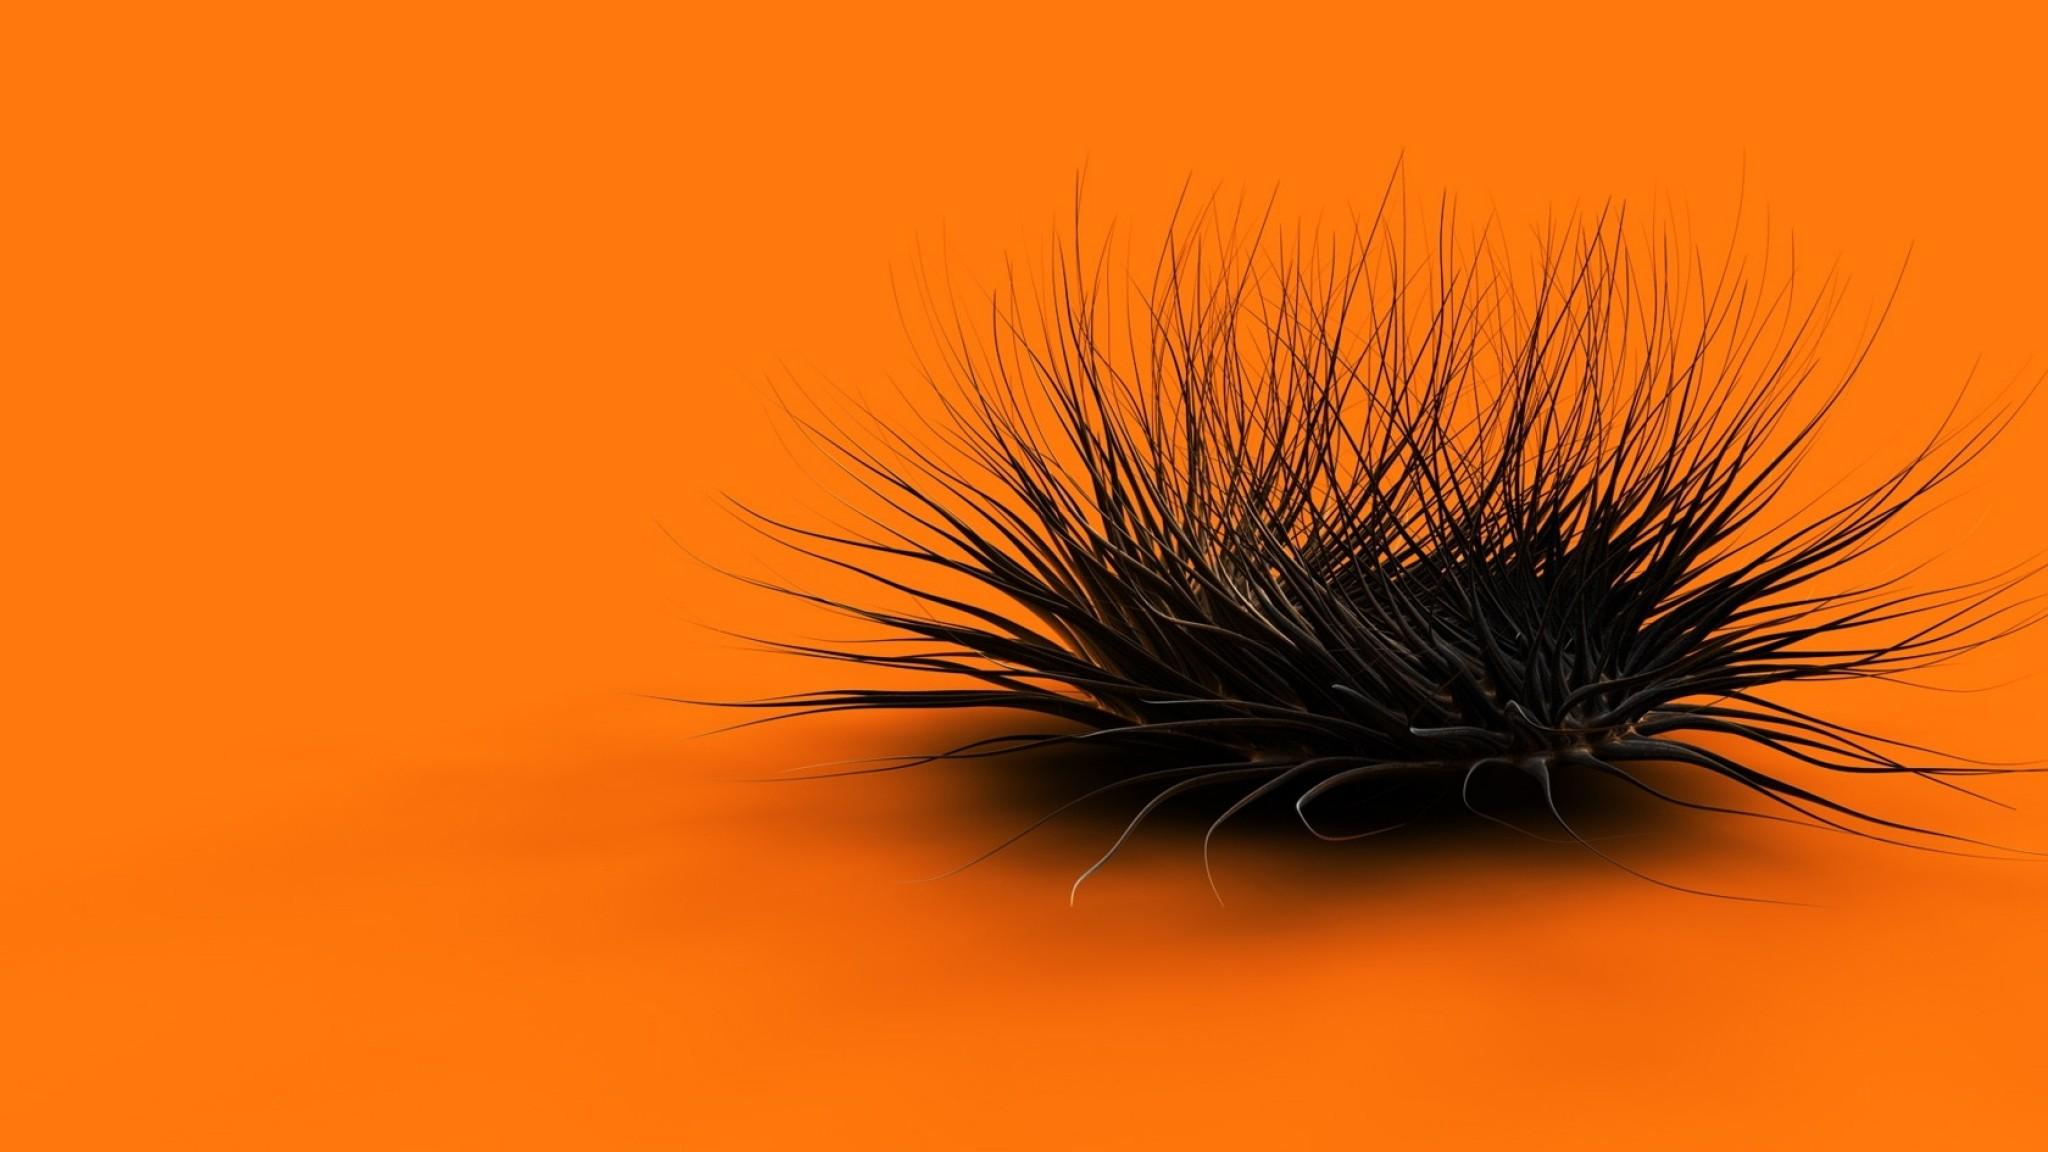 Preview wallpaper orange, black, feathers, form 2048×1152